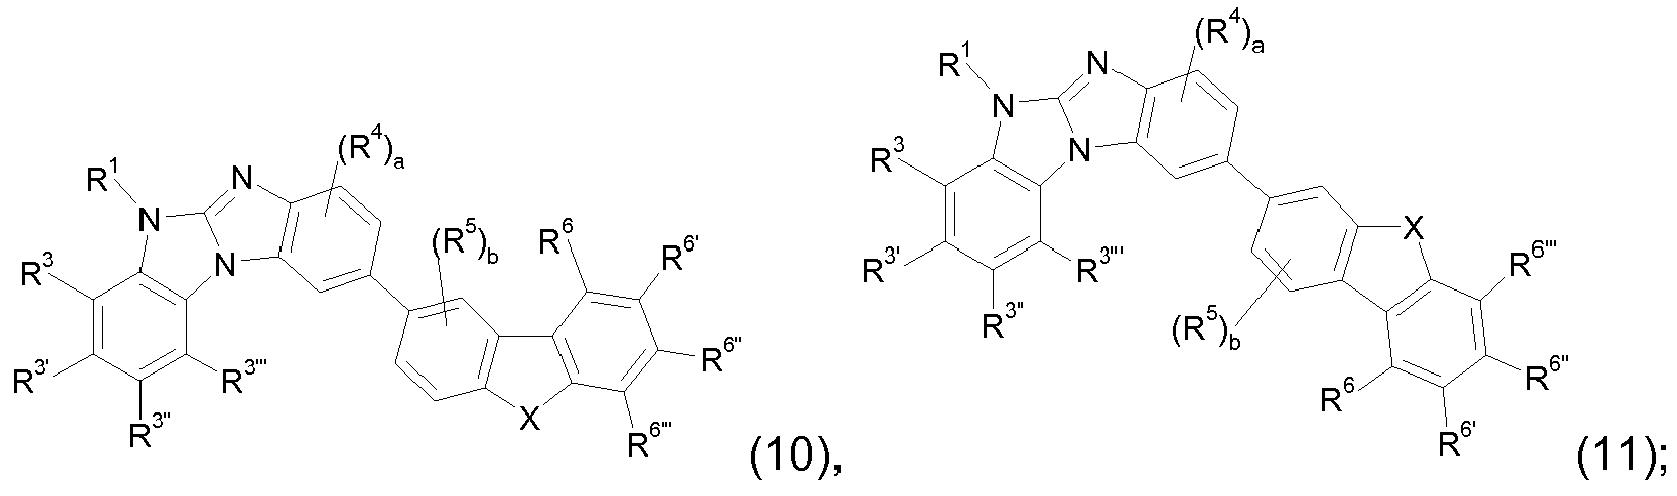 Figure imgb0879